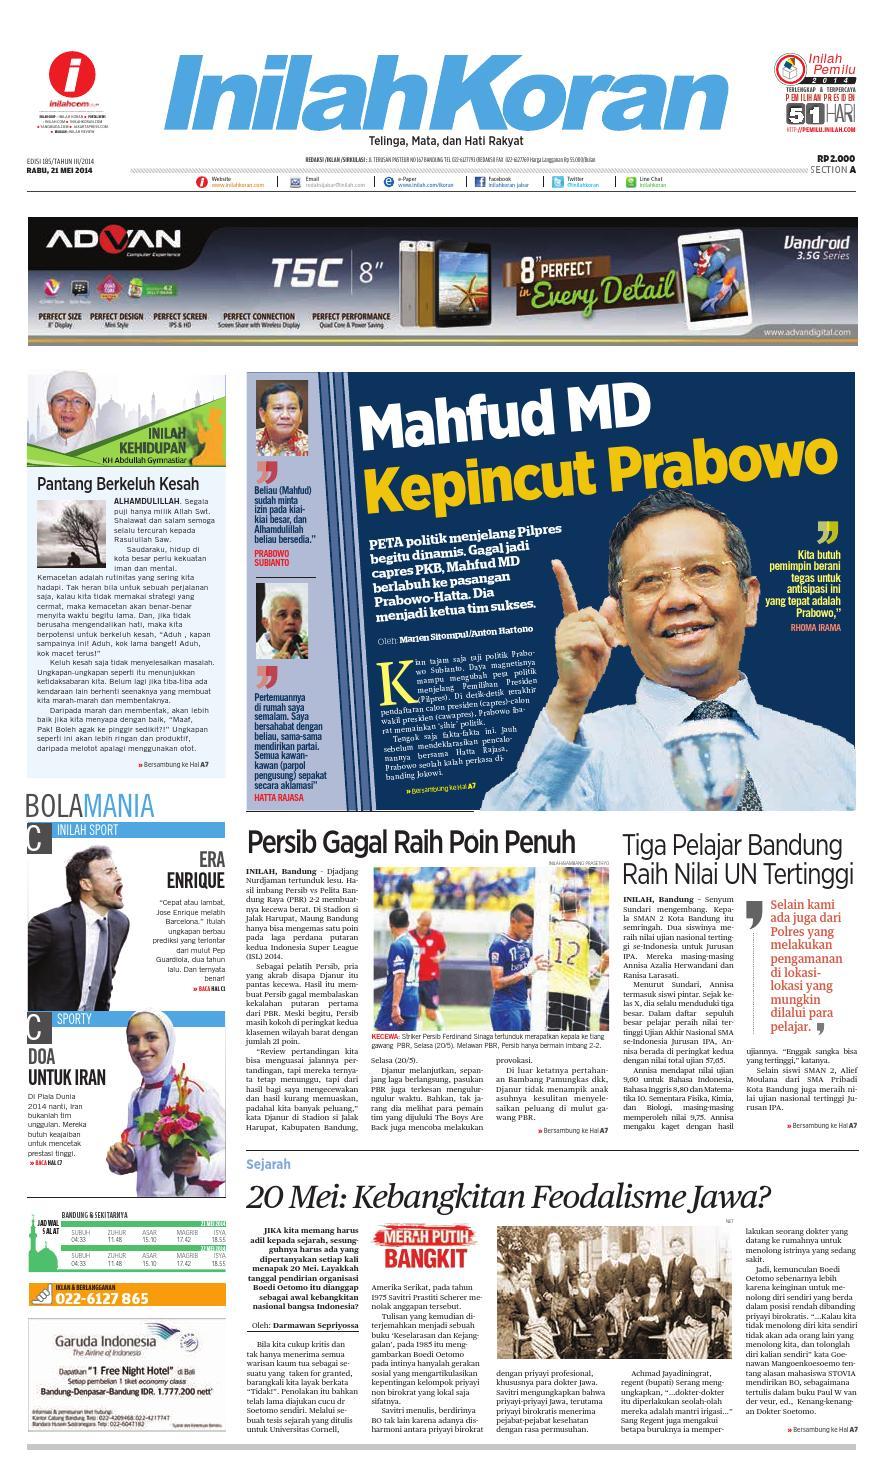 Mahfud MD Kepincut Prabowo by inilah koran - issuu d0633b31b3